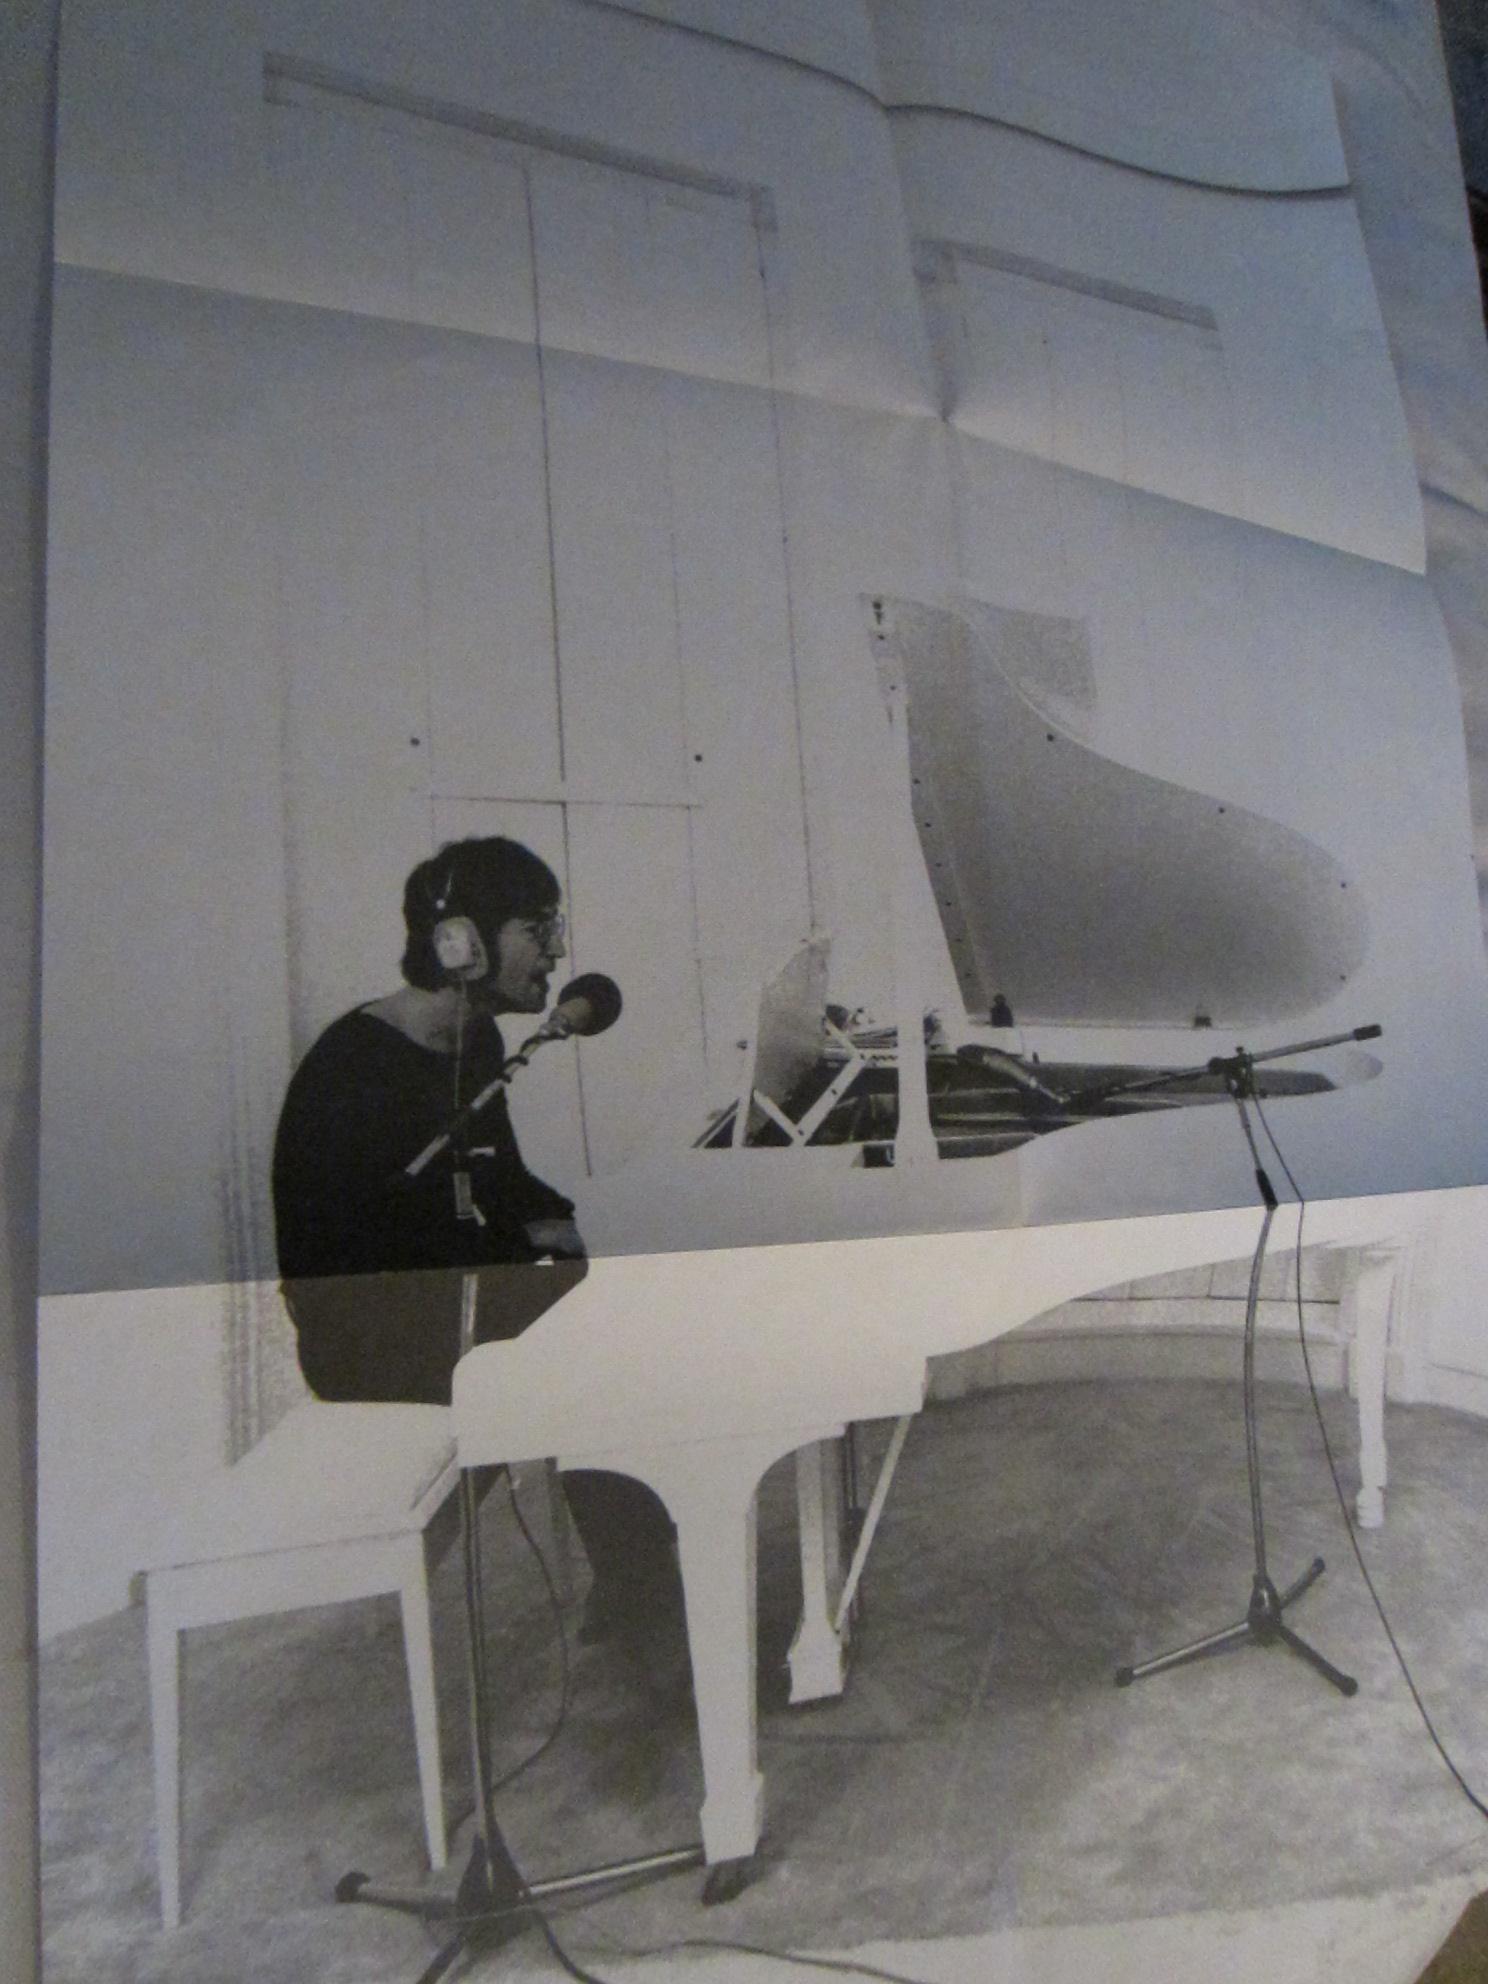 John Lennon Imagine LP Record Poster Photograph